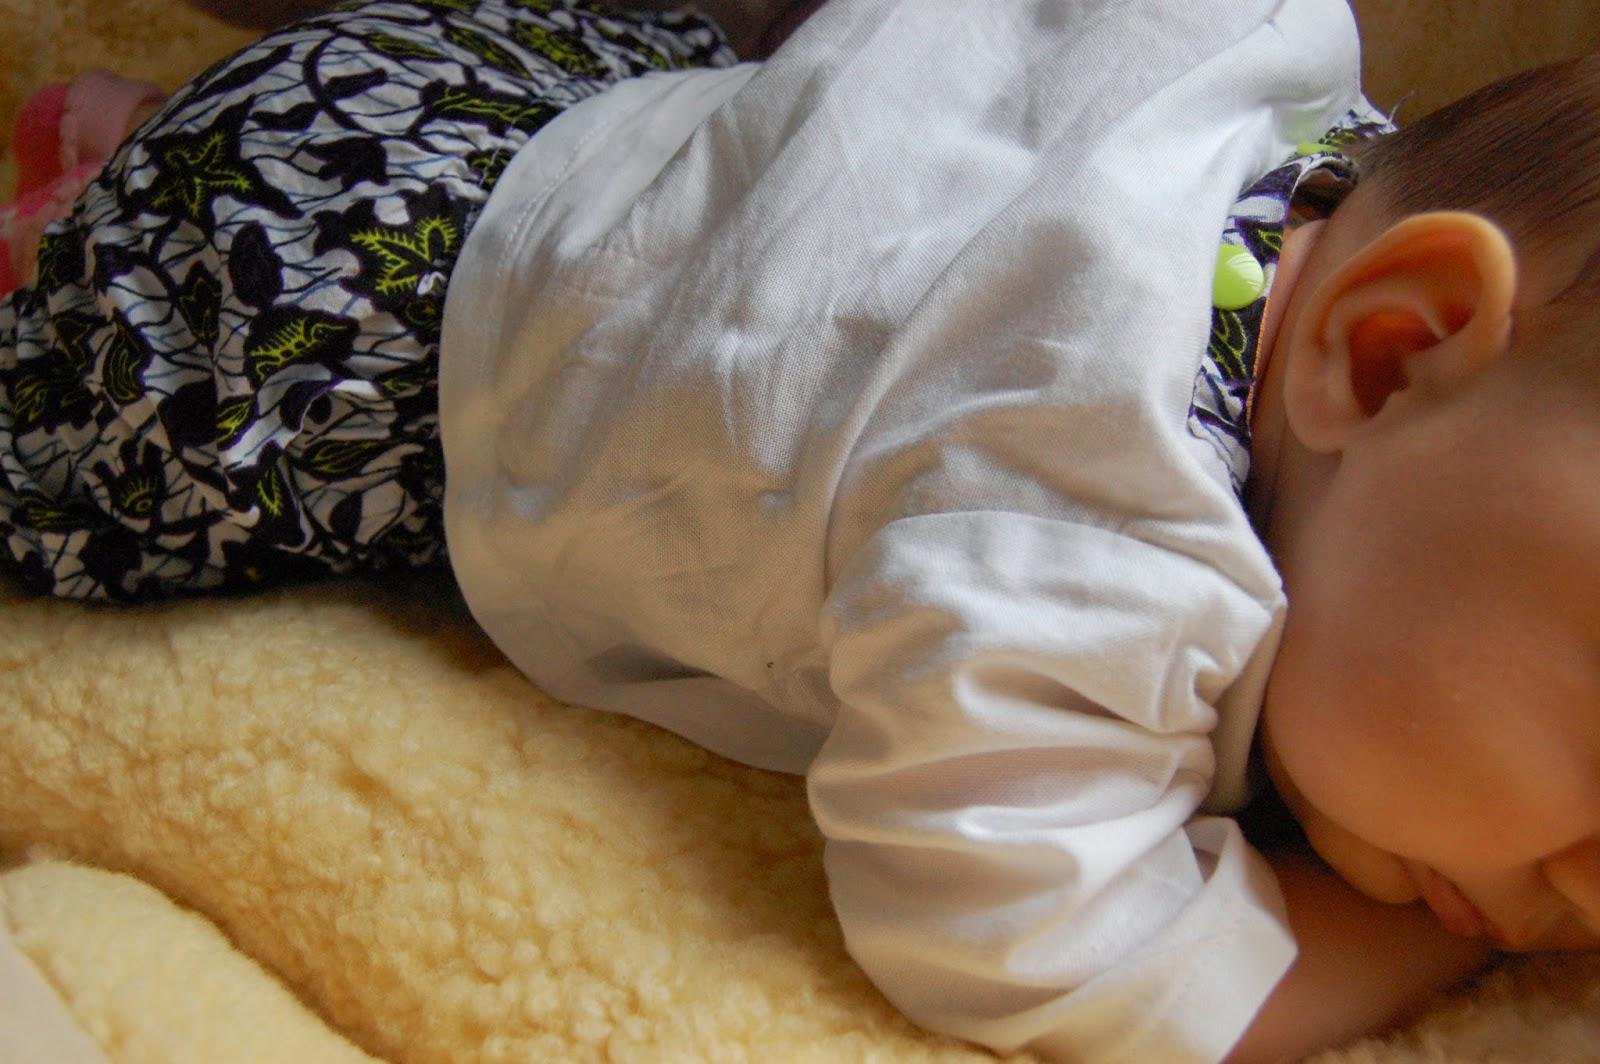 tunique-encolure-carrée-intemporels-bébé